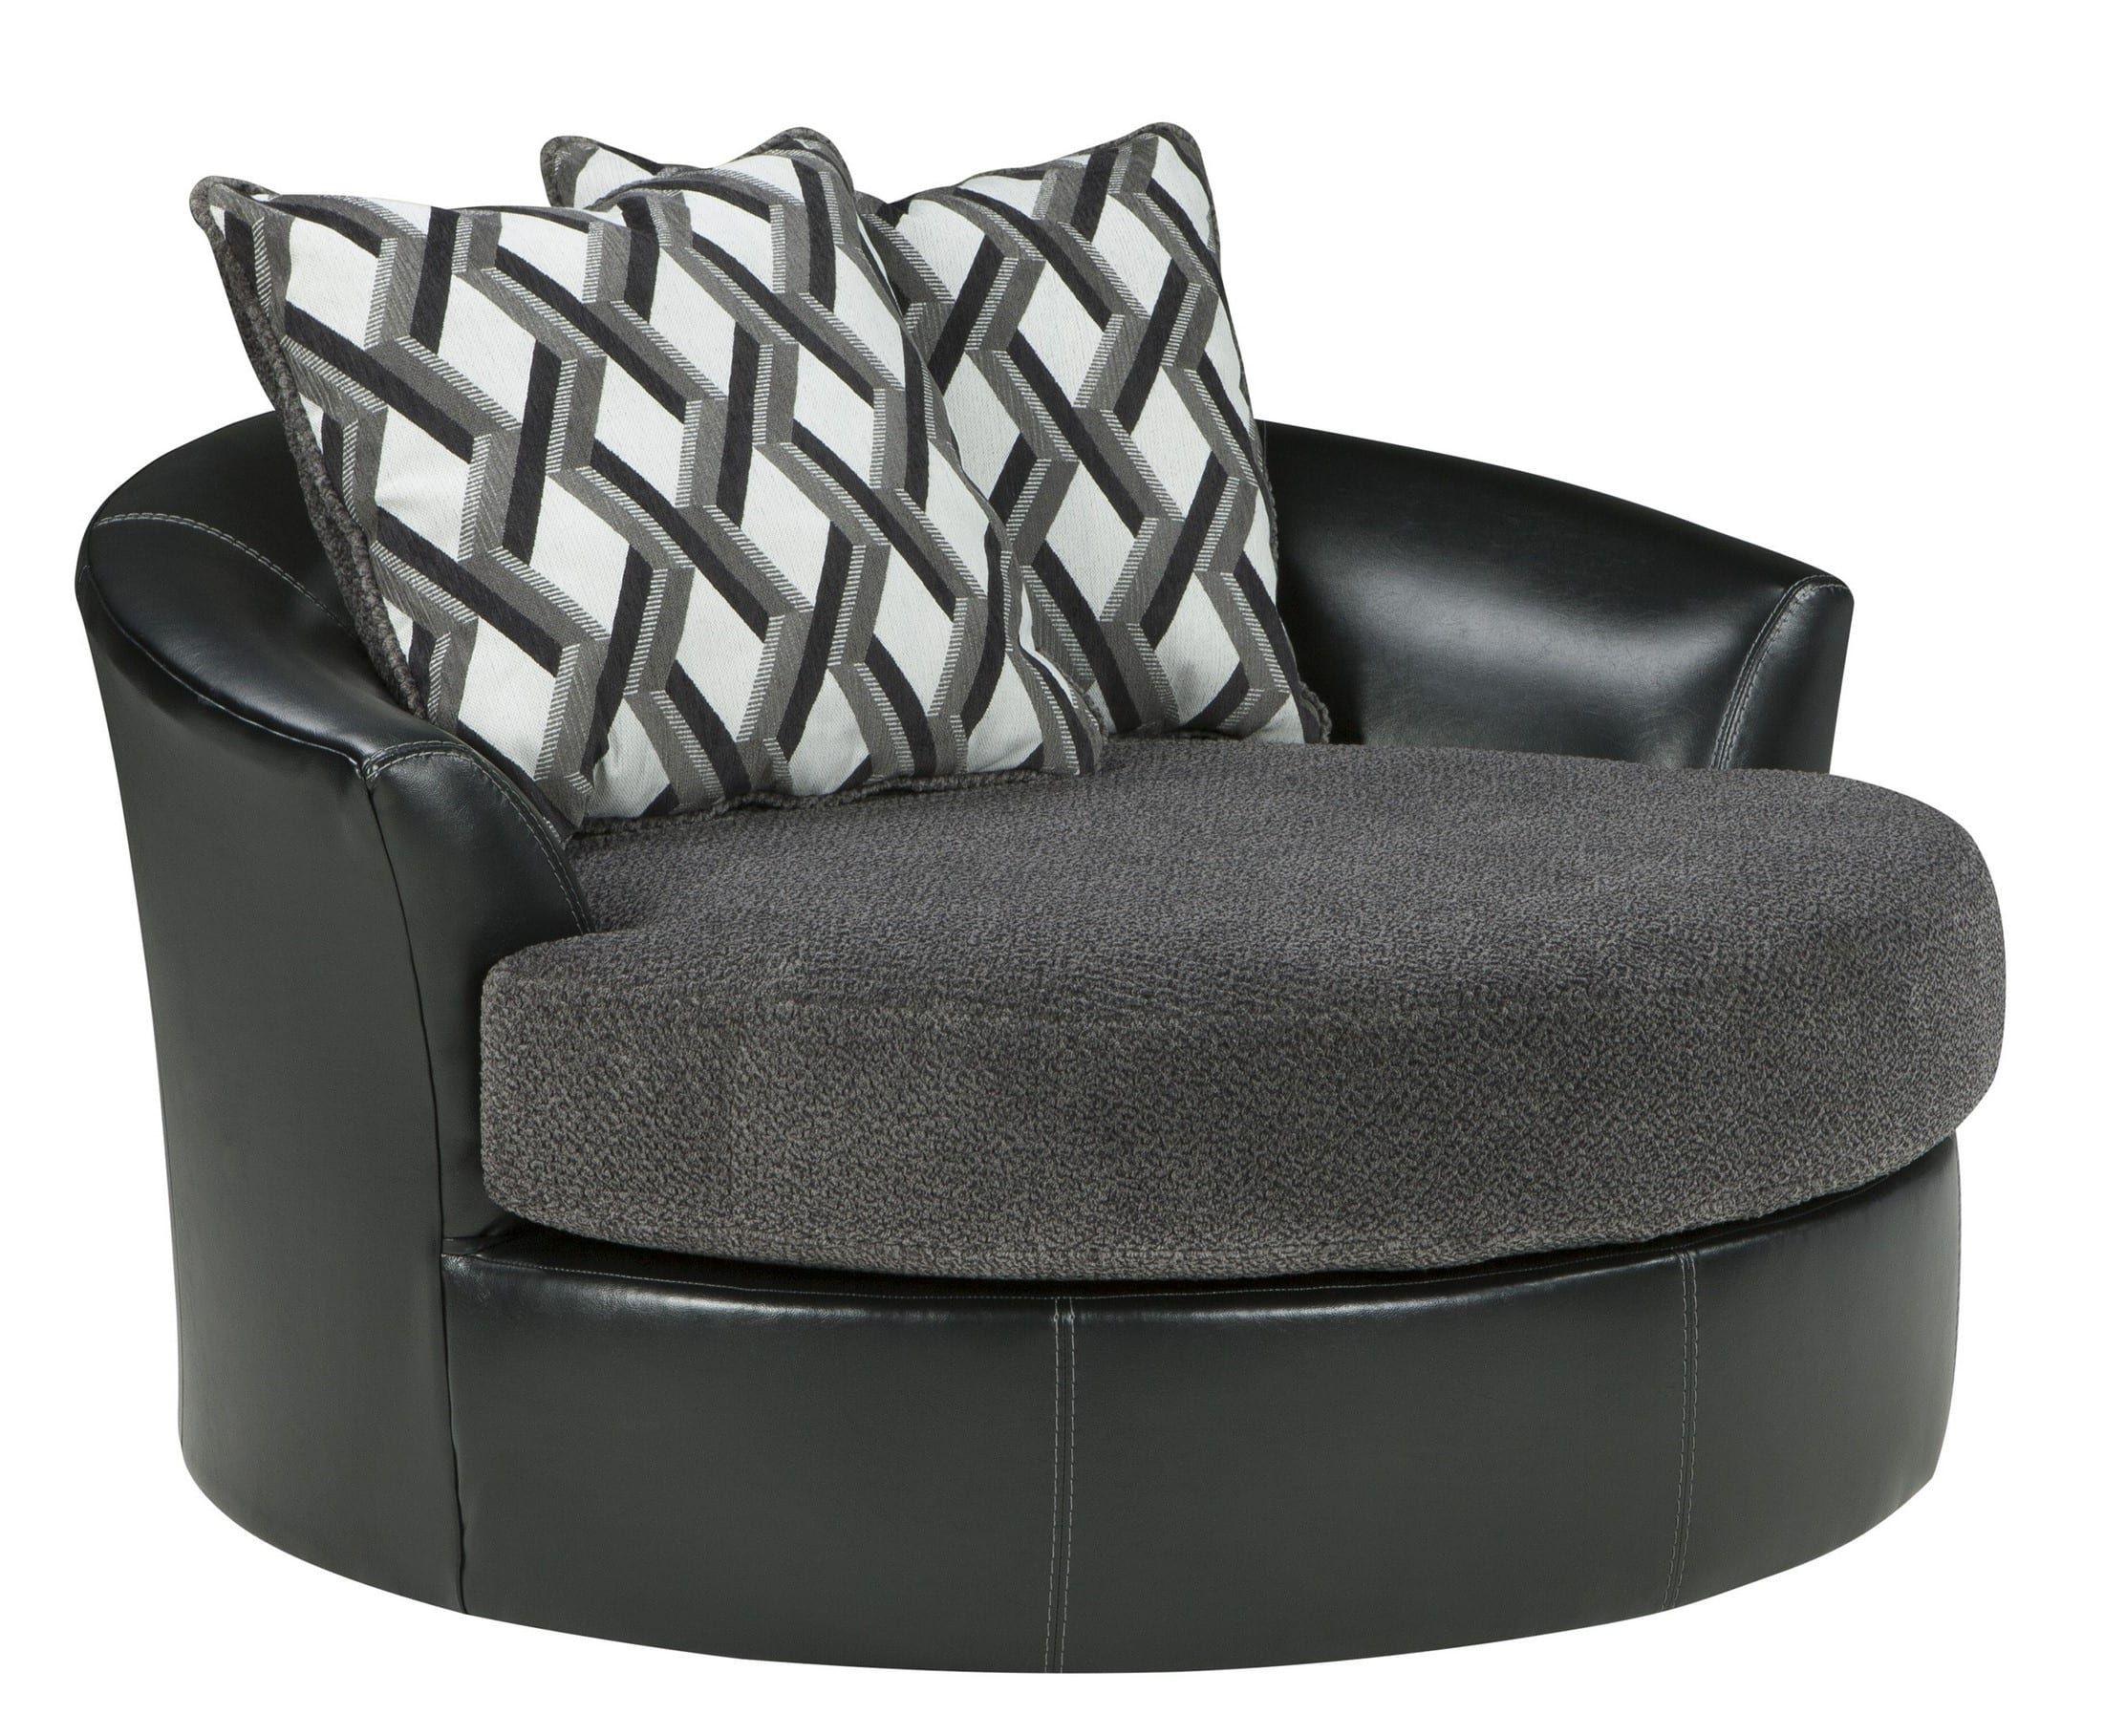 Kumasi Smoke Oversized Swivel Accent Chair | Interior Decorating Within Mesa Foam Oversized Sofa Chairs (Image 11 of 20)